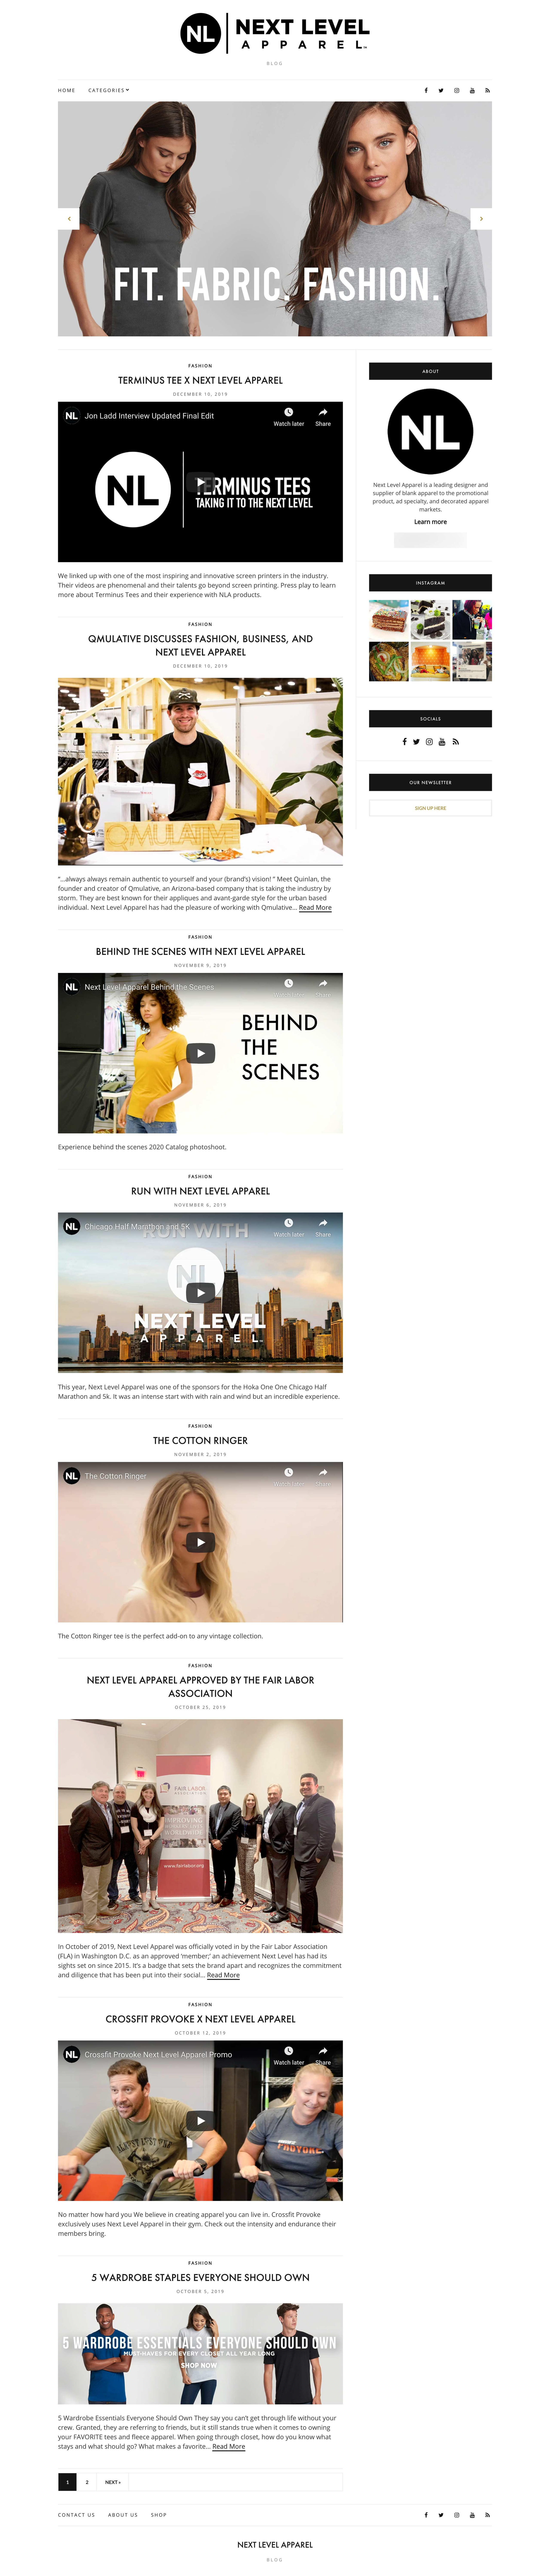 WordPress Development for Fashion Industry